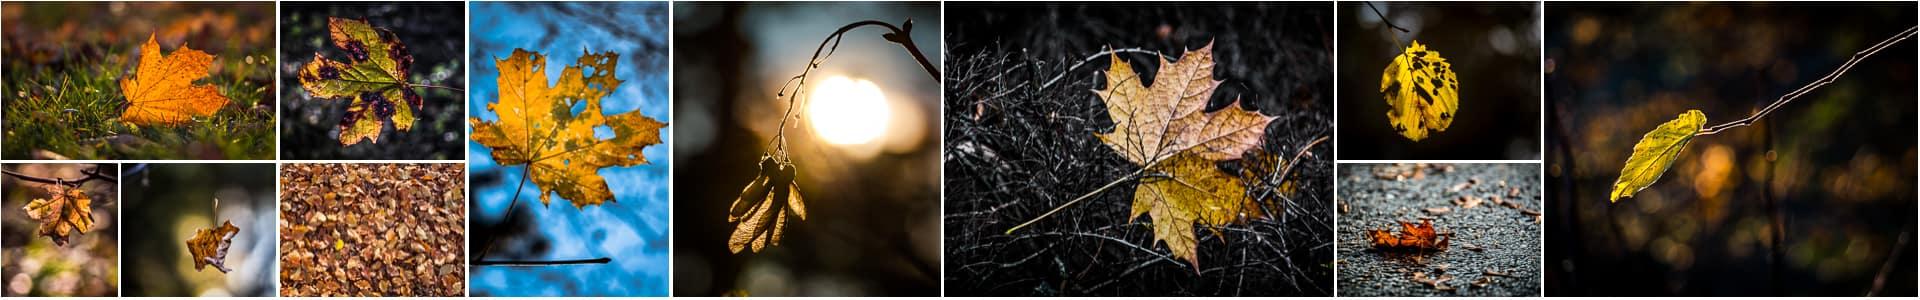 Fotoworkshop bunter Herbstwald